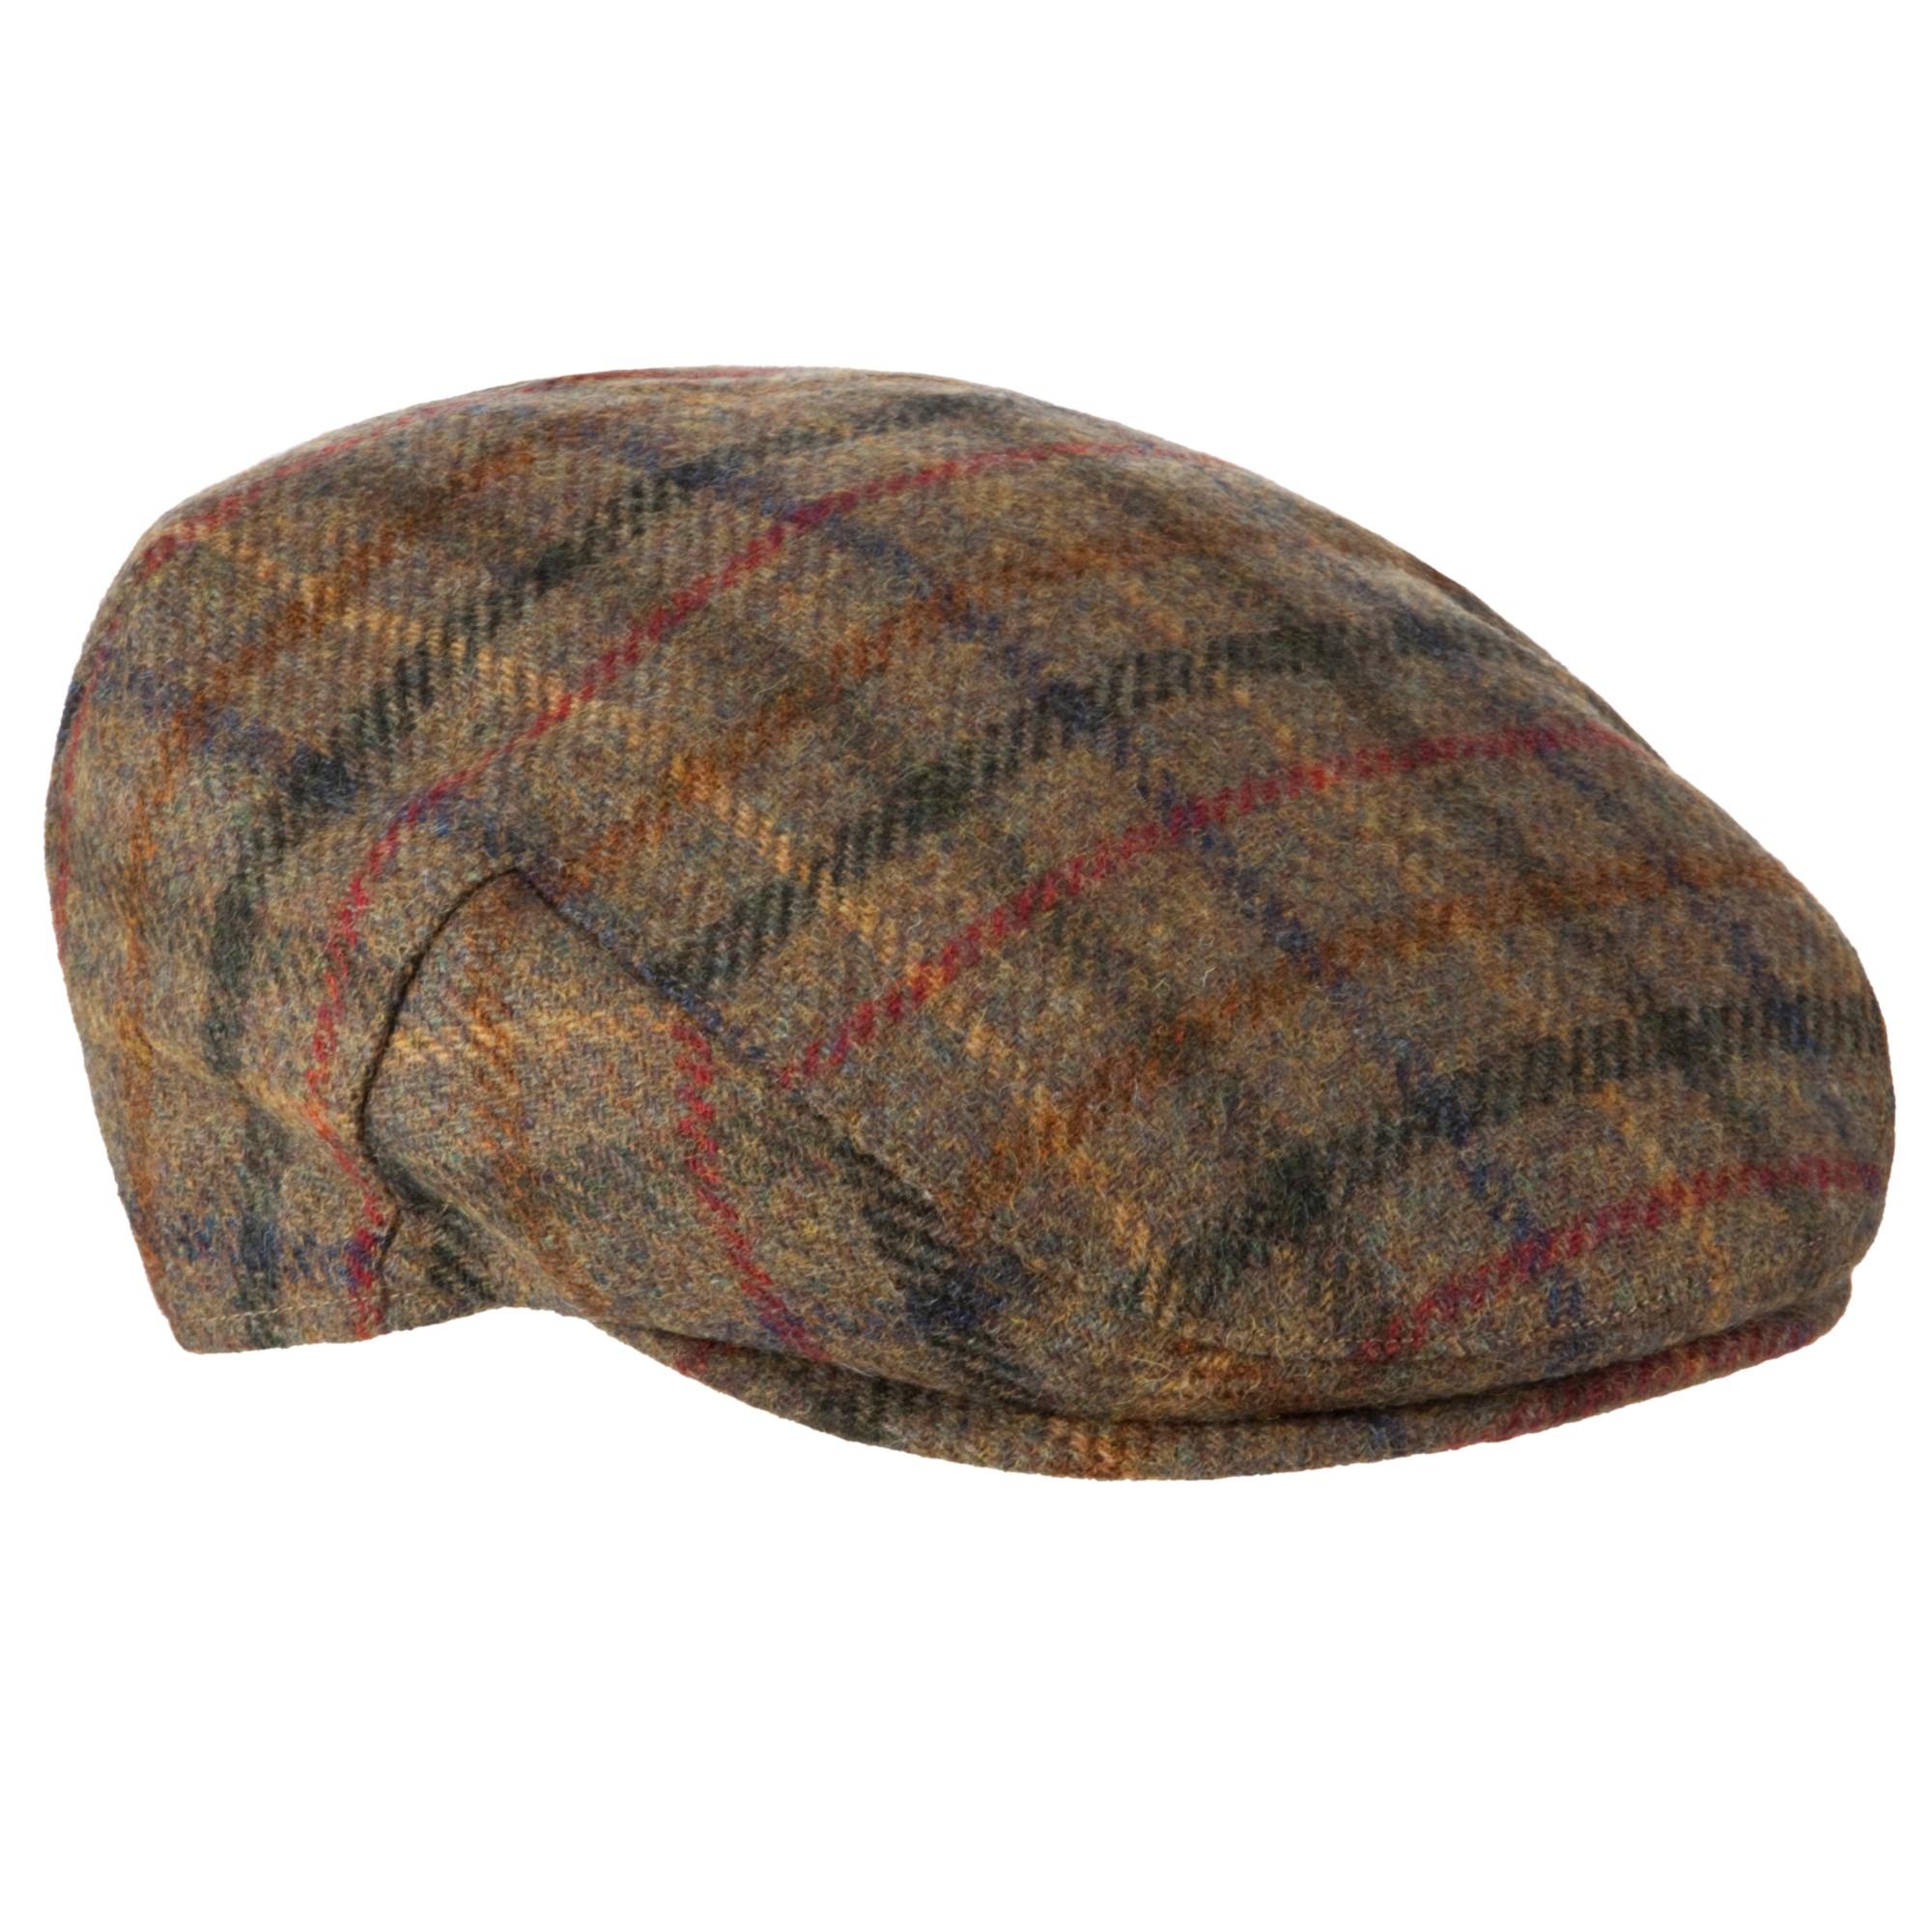 Barbour Moons Tweed Cap in Natural for Men - Lyst 2c4865c58bd9